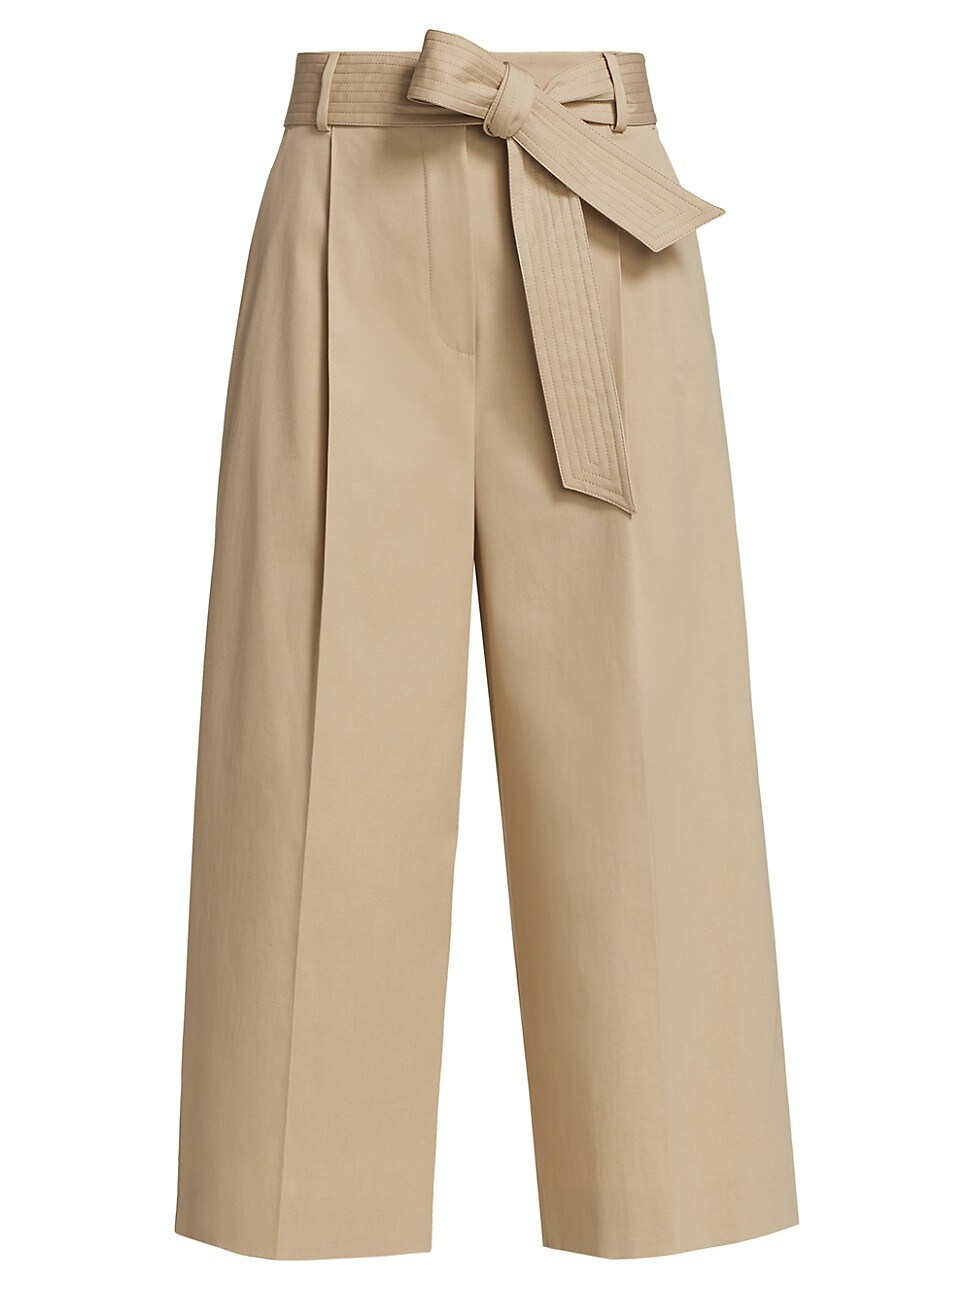 Max Mara Pants WOMEN'S GHISA WIDE-LEG CROPPED BELTED PANTS